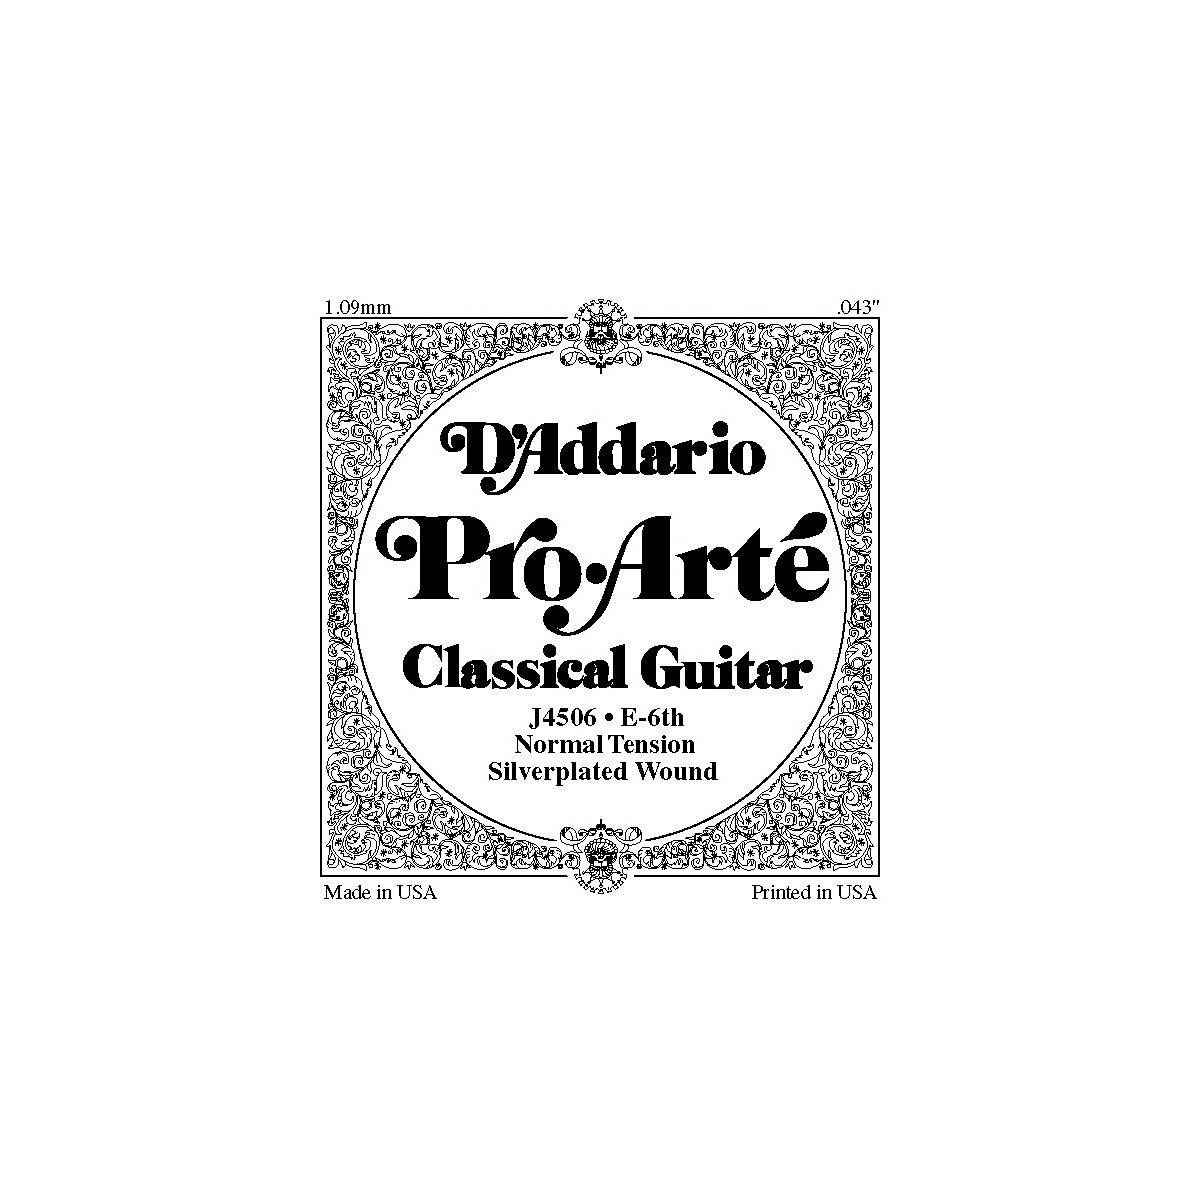 D'Addario J45 E-6 Pro-Arte Composite Normal LP Single Classical Guitar String